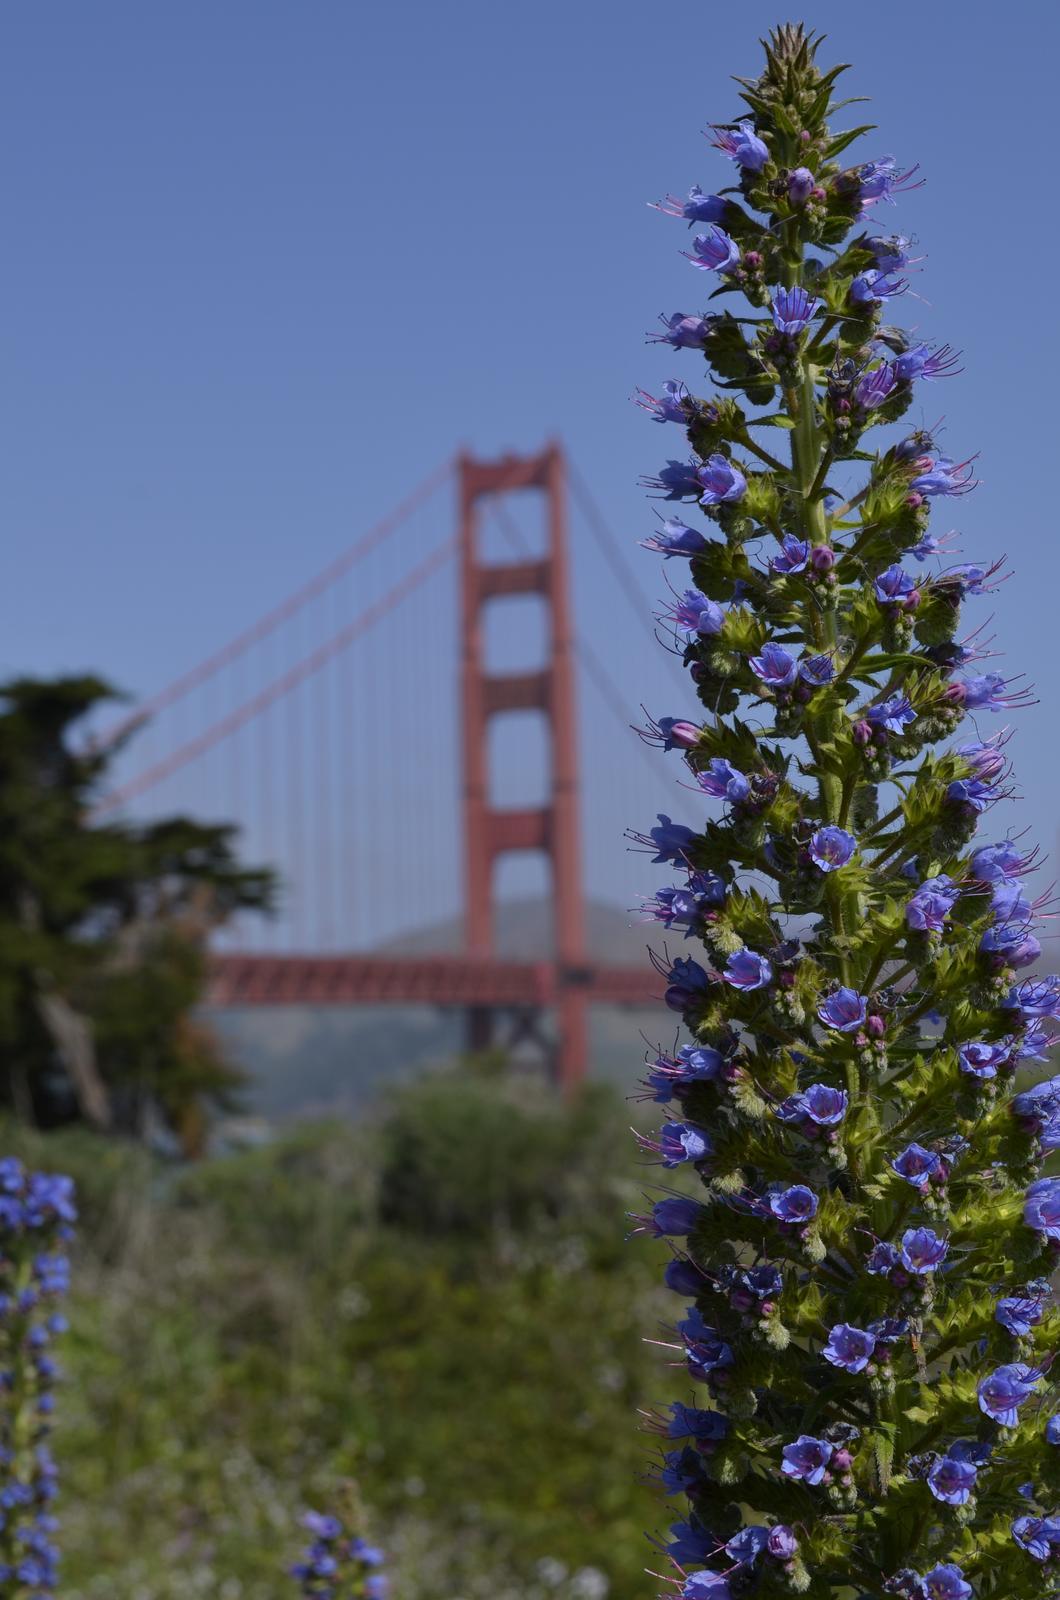 """If you can dream it, you can do it."" - Golden Gate predstavovať isto netreba :)"